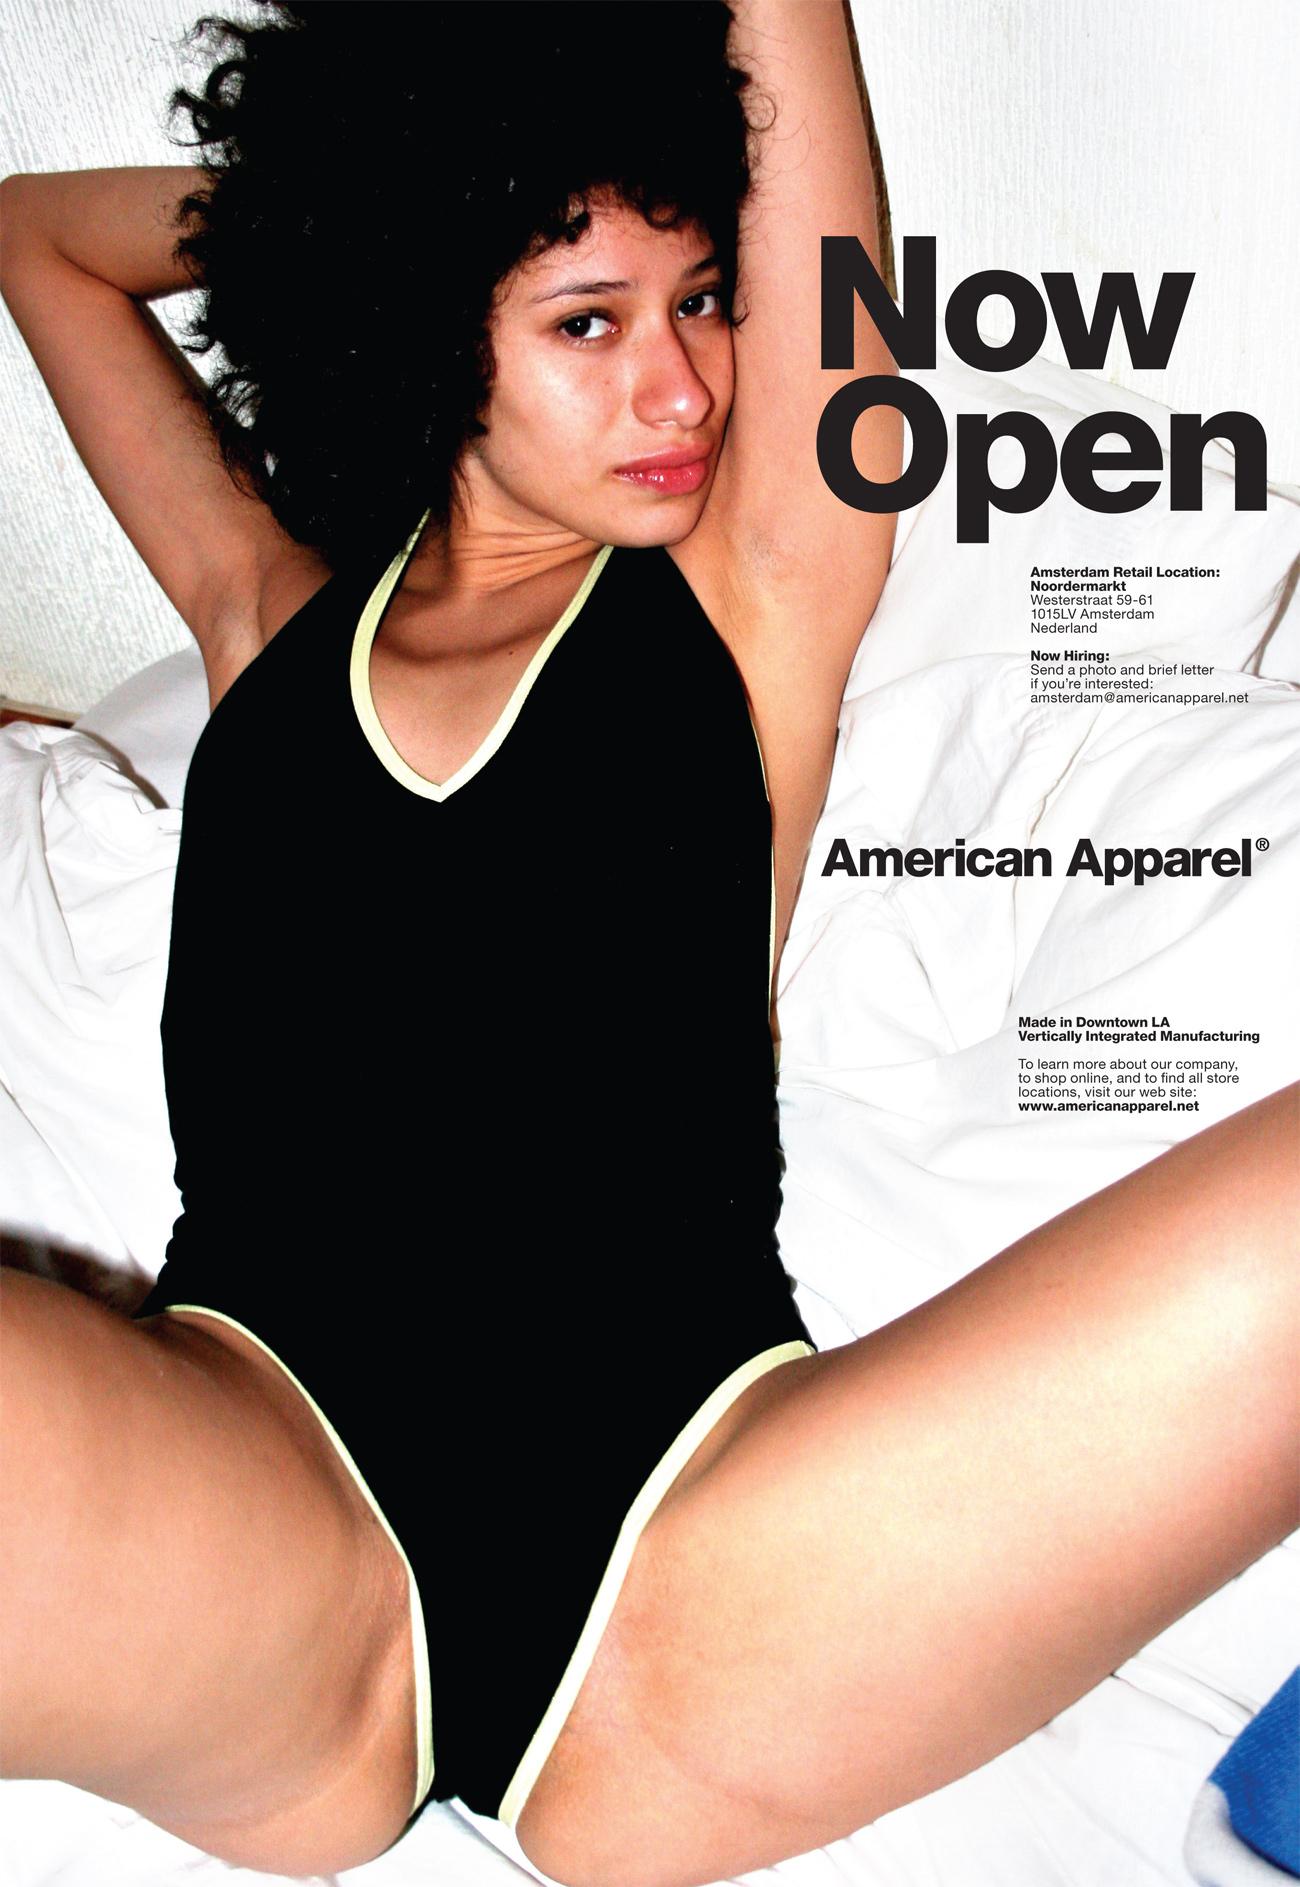 now open kim kardashian 1920 1200 nov302010 500x312 Kim Kardashian